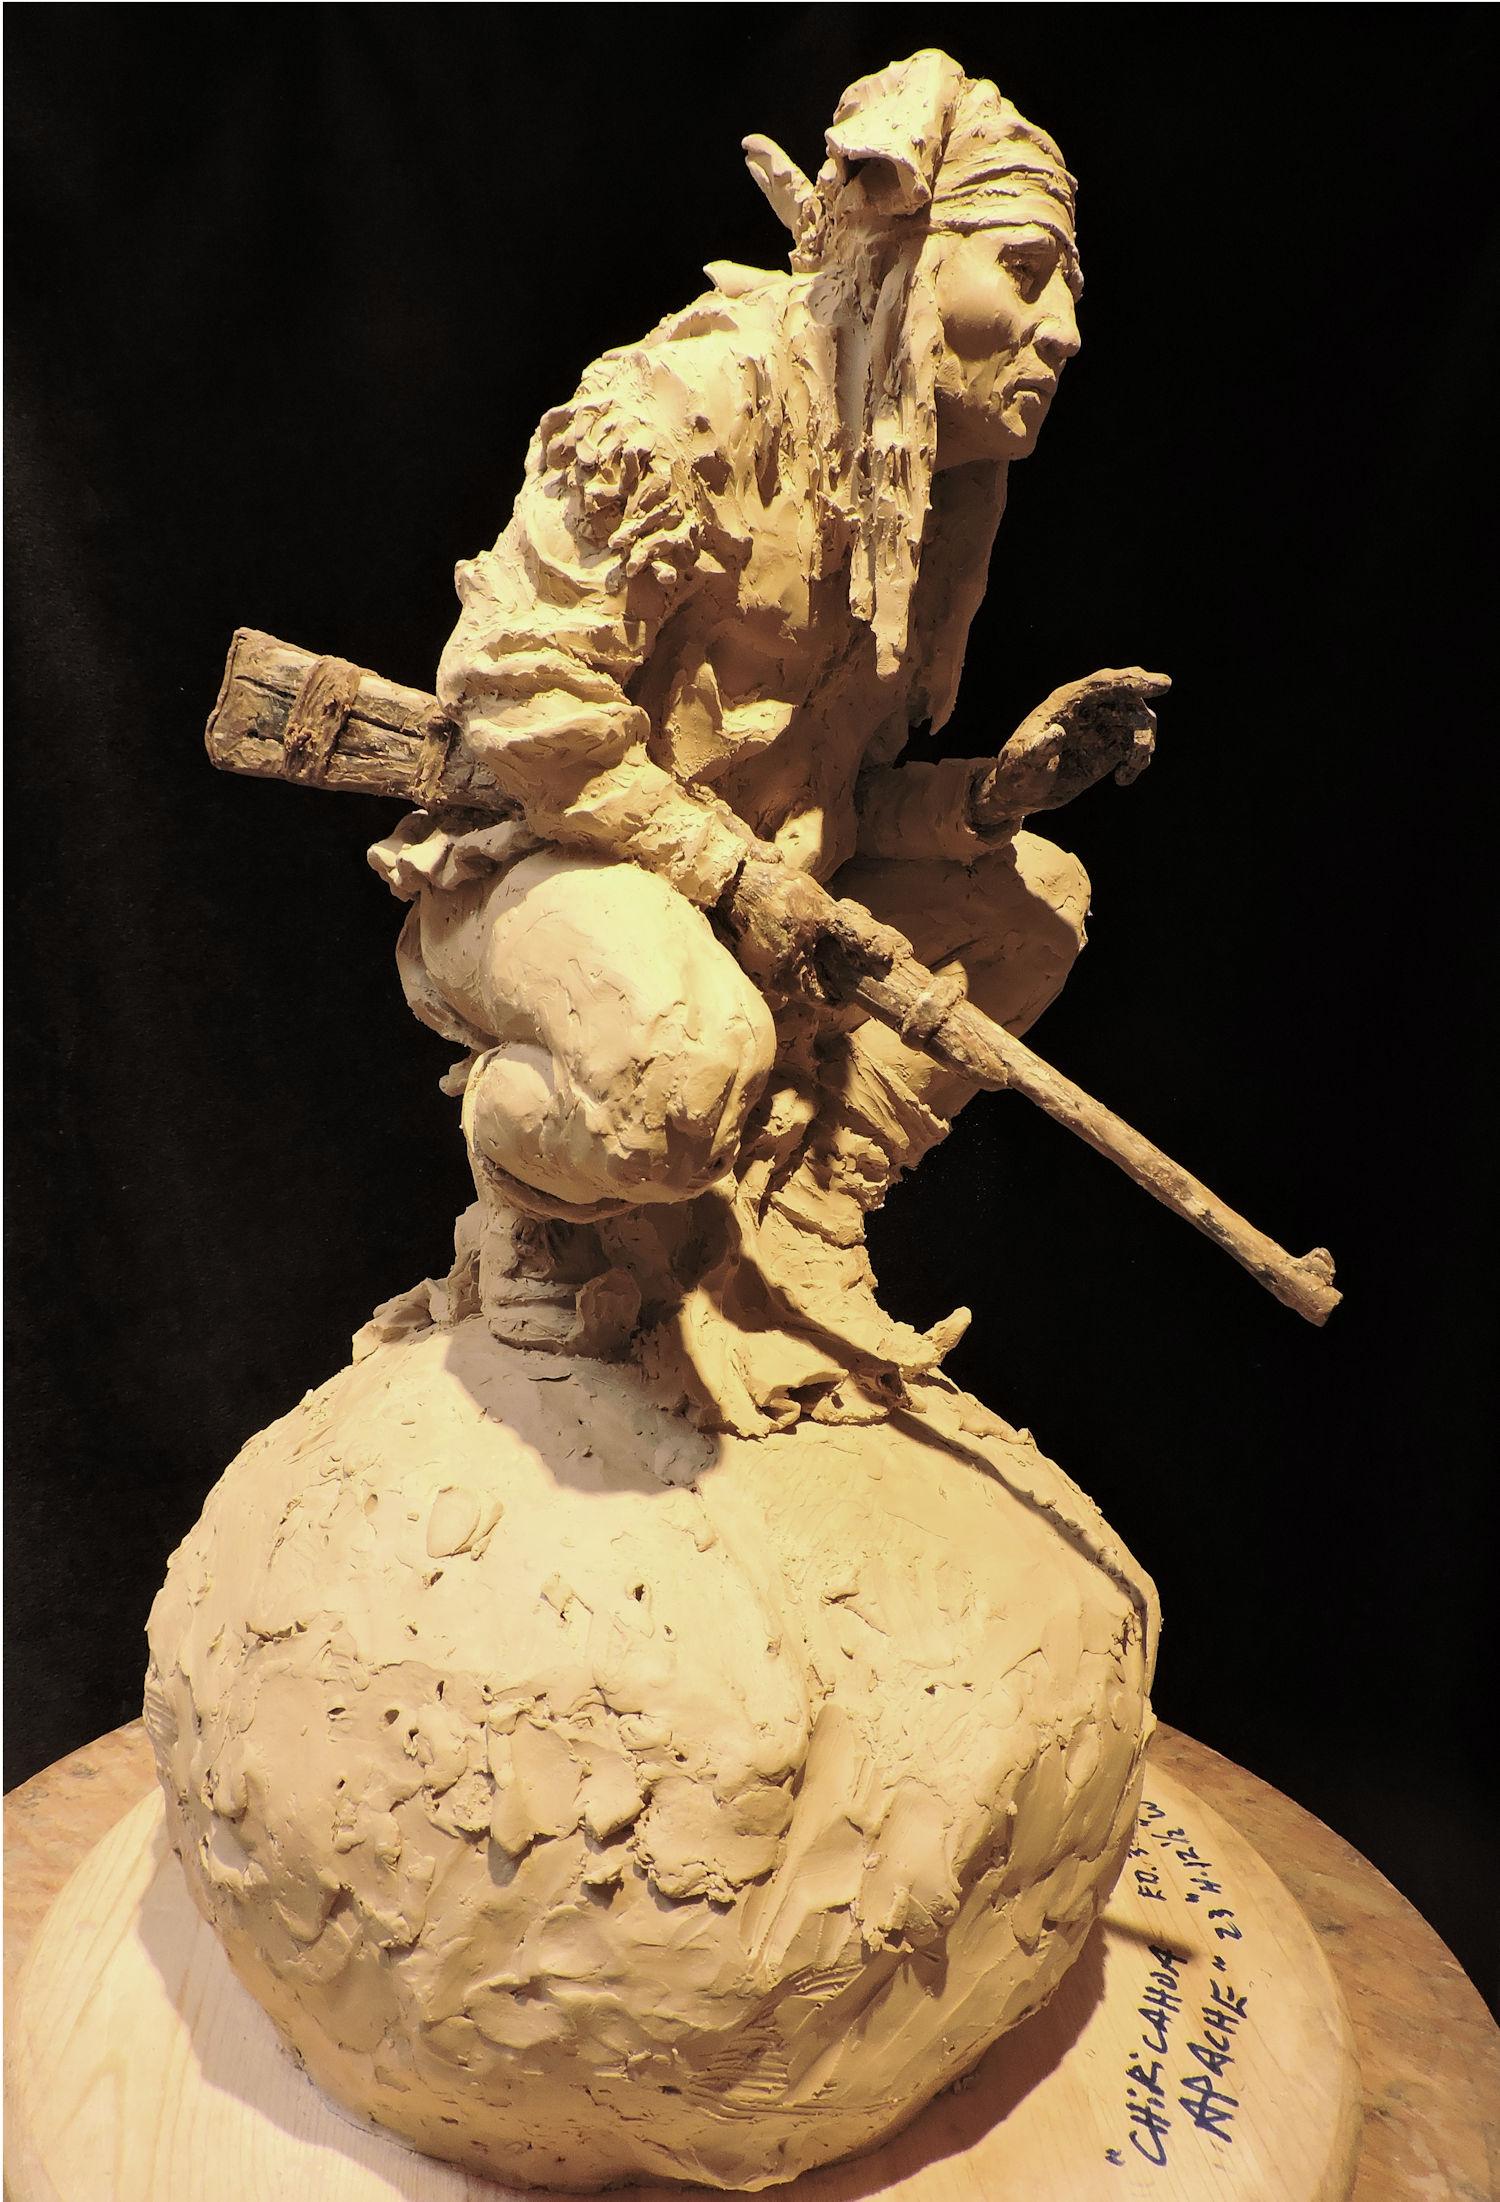 "Chiricahua Apache   Clay Precast for bronze    23"" x 12.5"" x 14""   Edition of 30   $4,800"